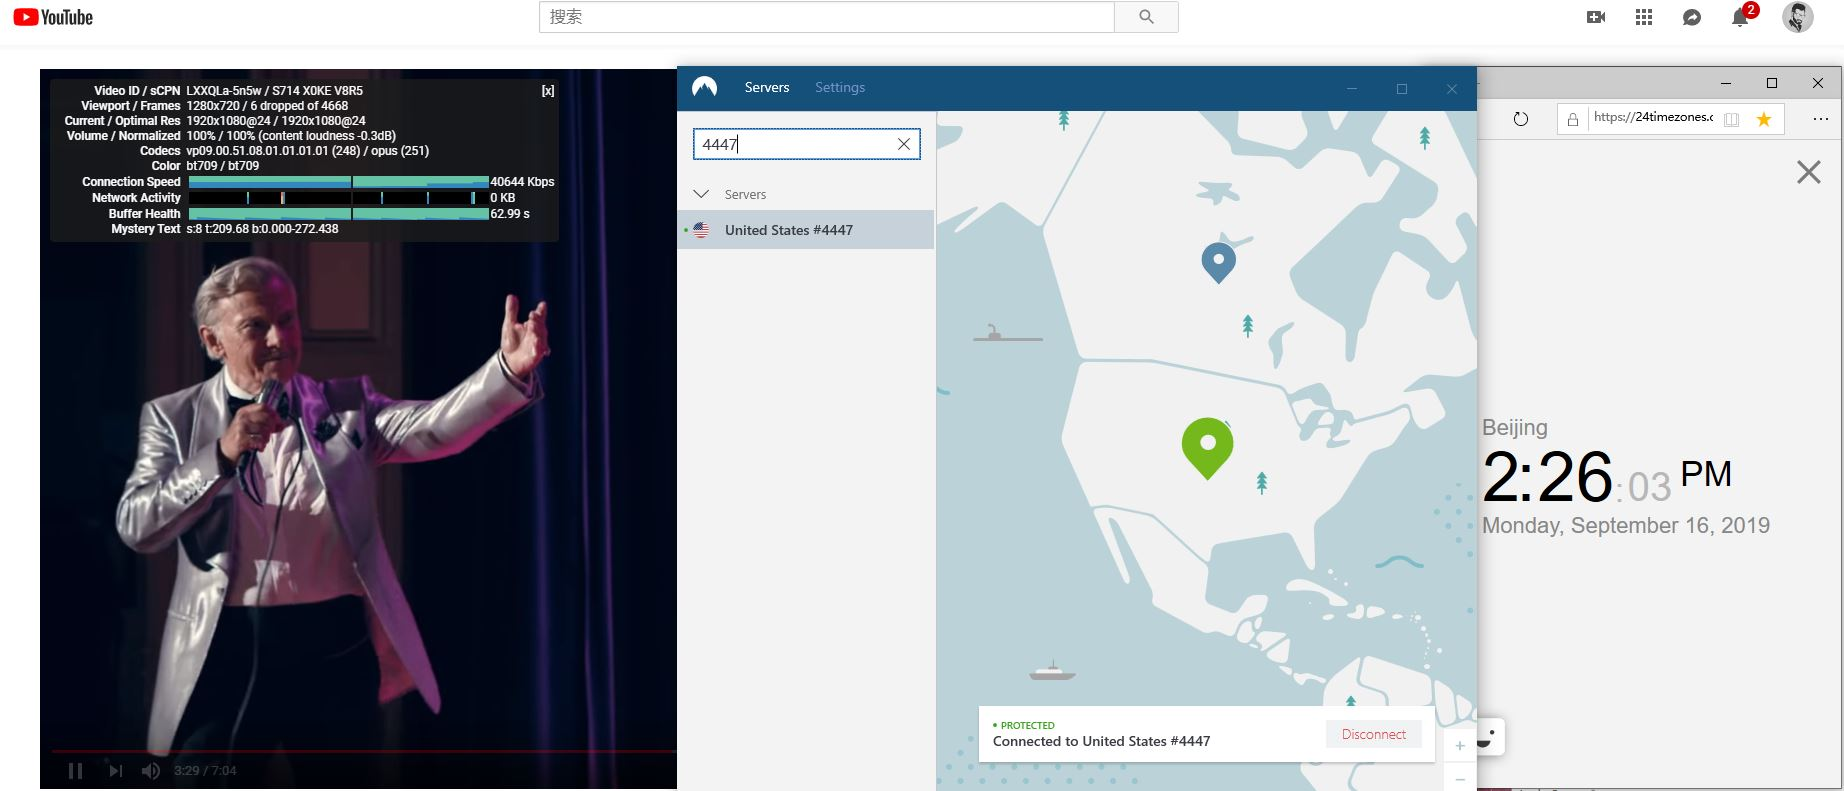 windows NordVPN United States 4447 服务器 中国翻墙 科学上网 YouTube速度测试-3-20190916